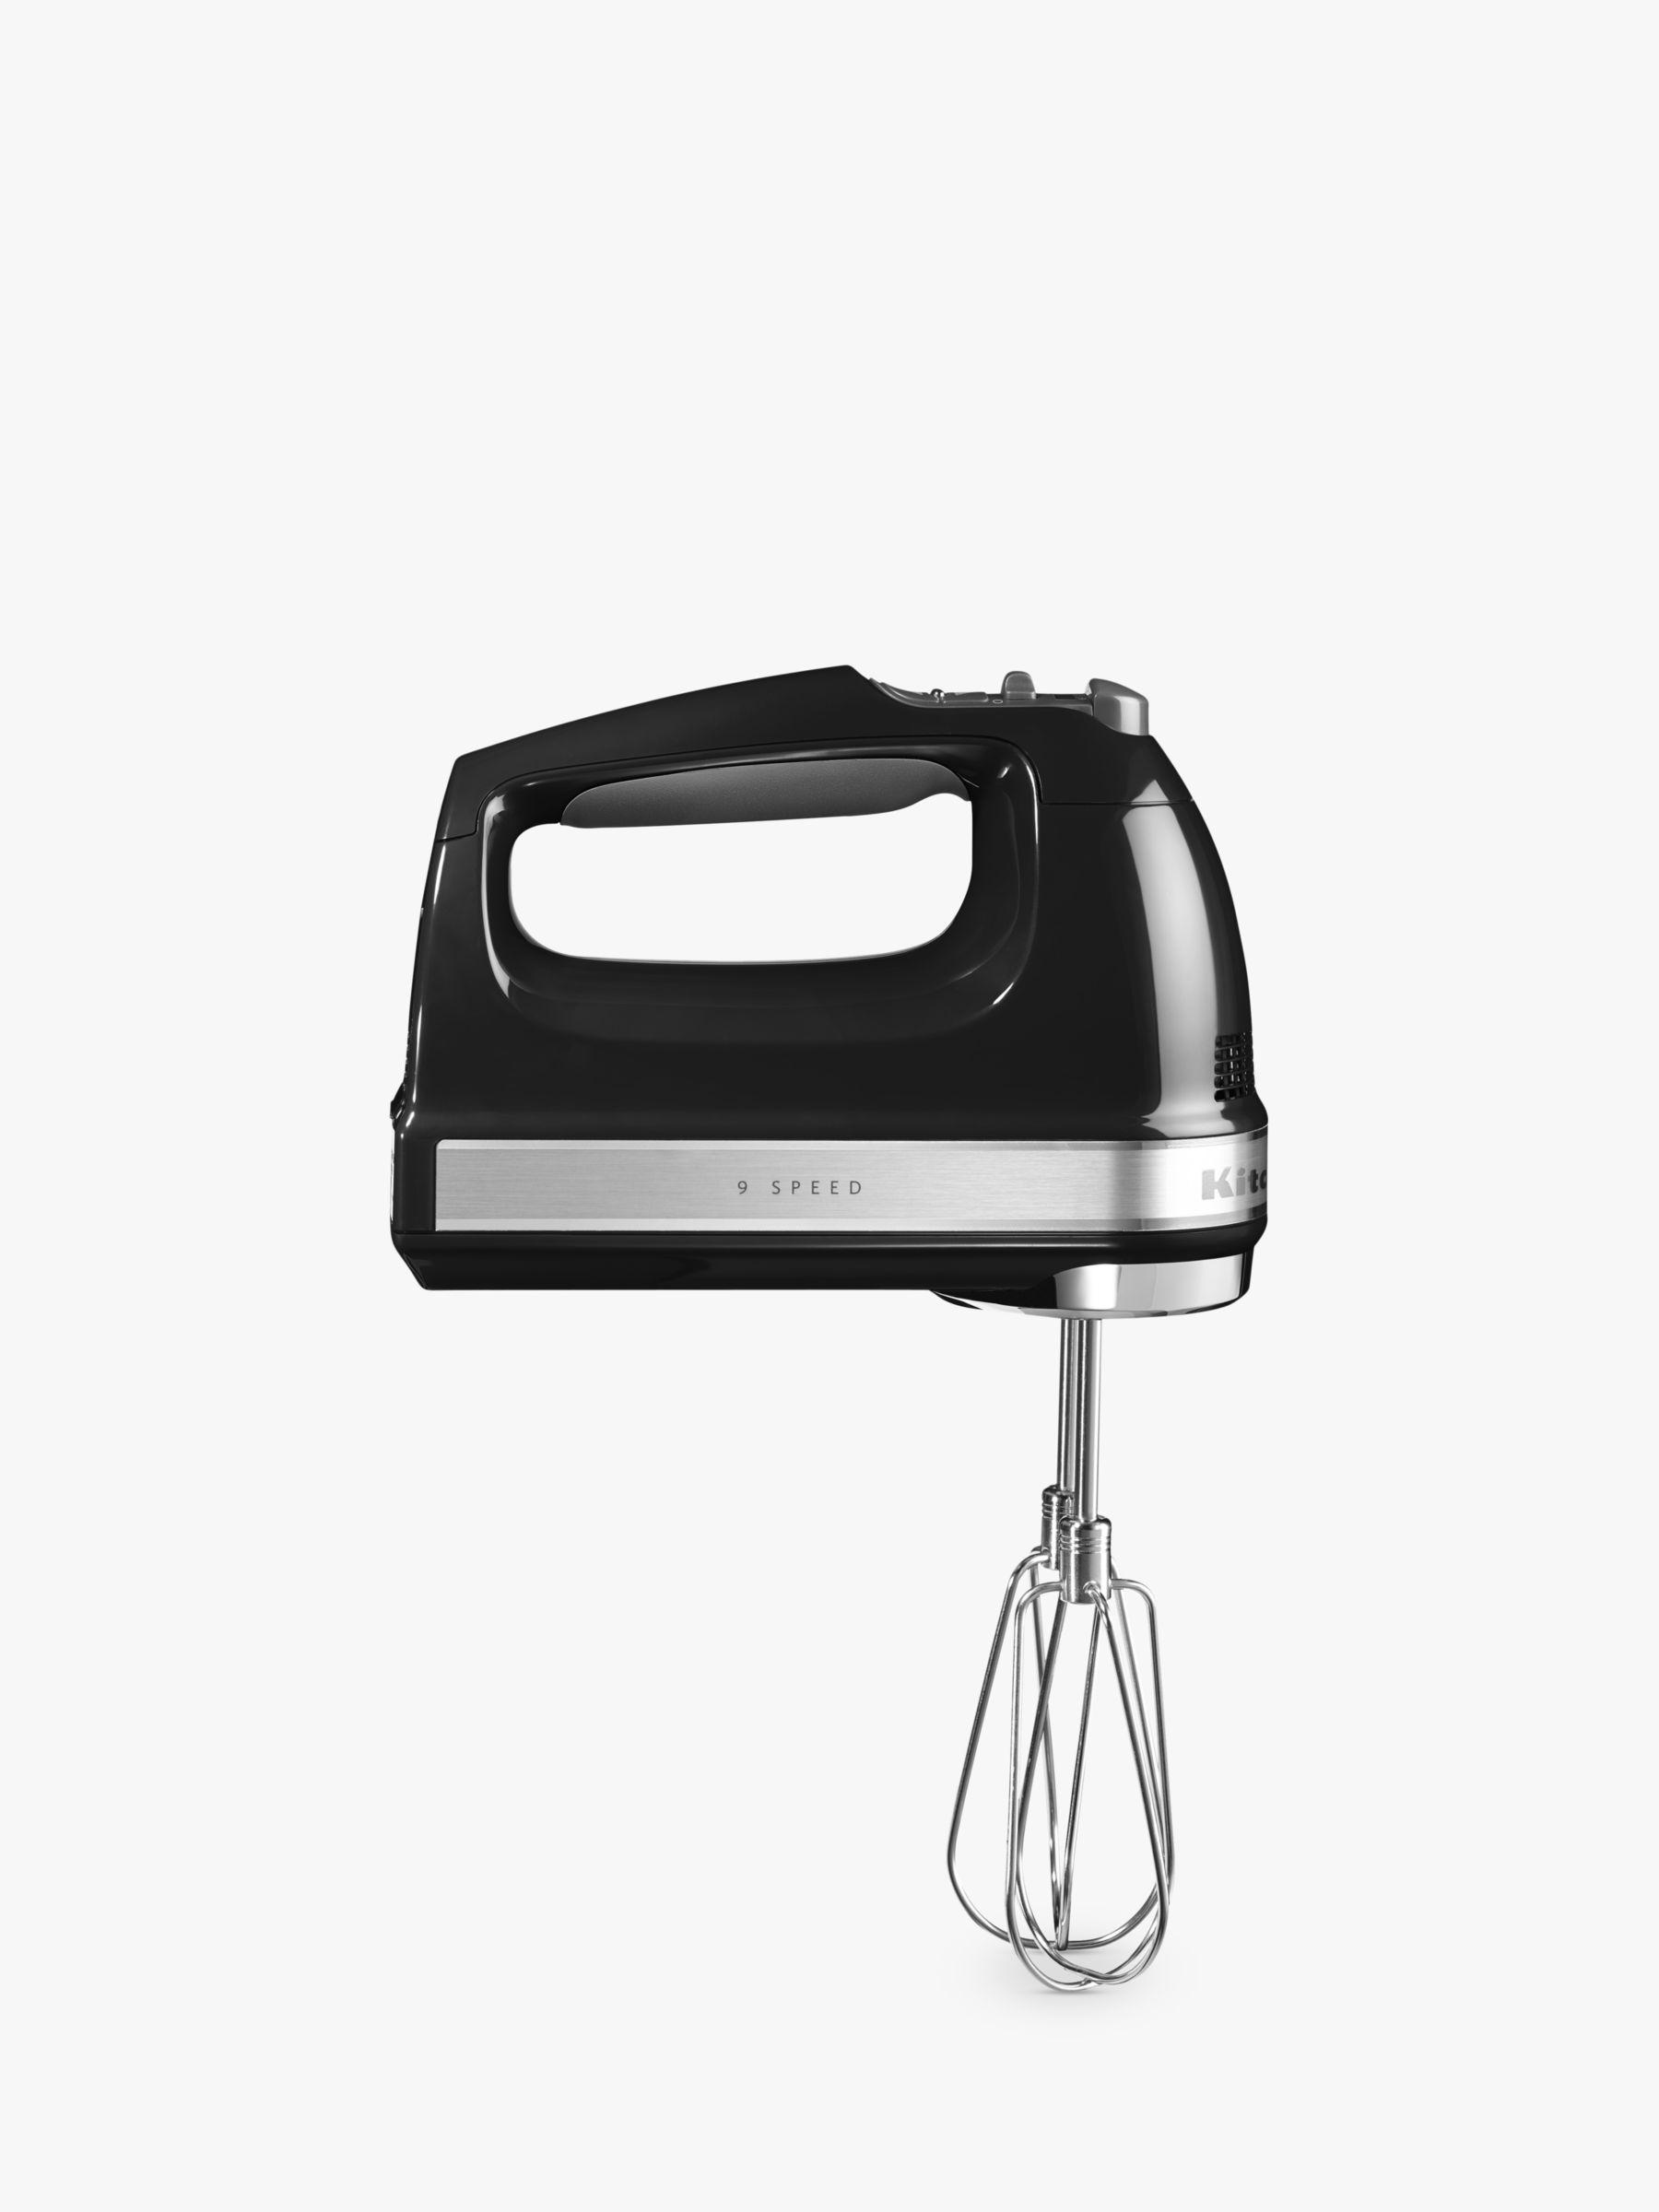 KitchenAid KitchenAid Hand Mixer